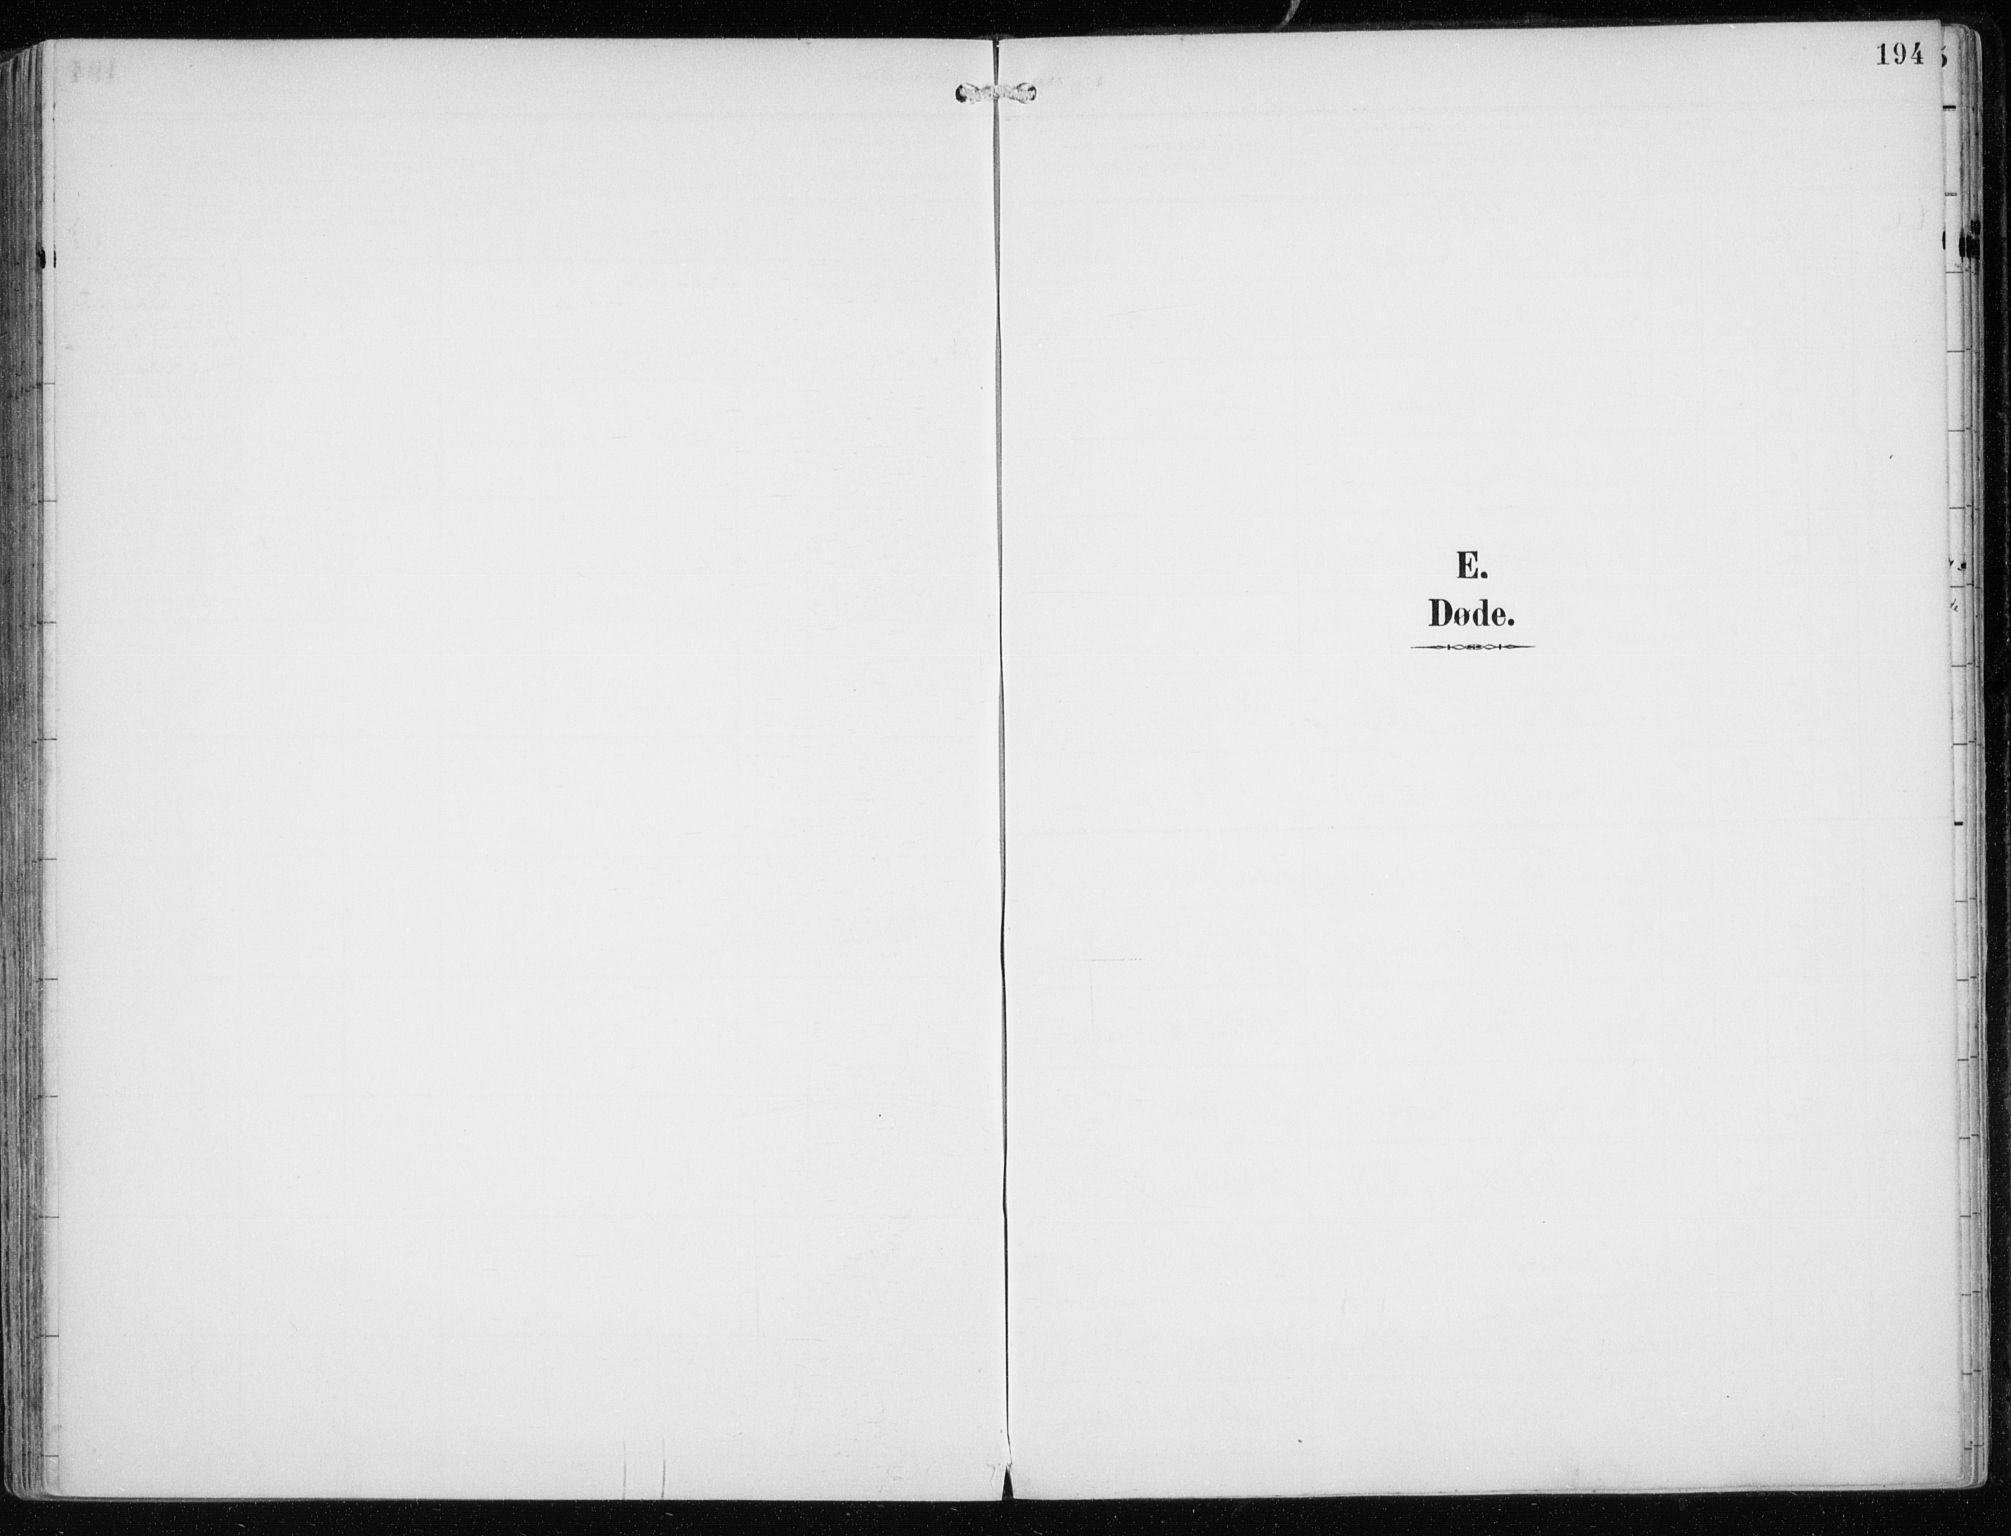 SATØ, Skjervøy sokneprestkontor, H/Ha/Haa/L0016kirke: Ministerialbok nr. 16, 1892-1908, s. 194